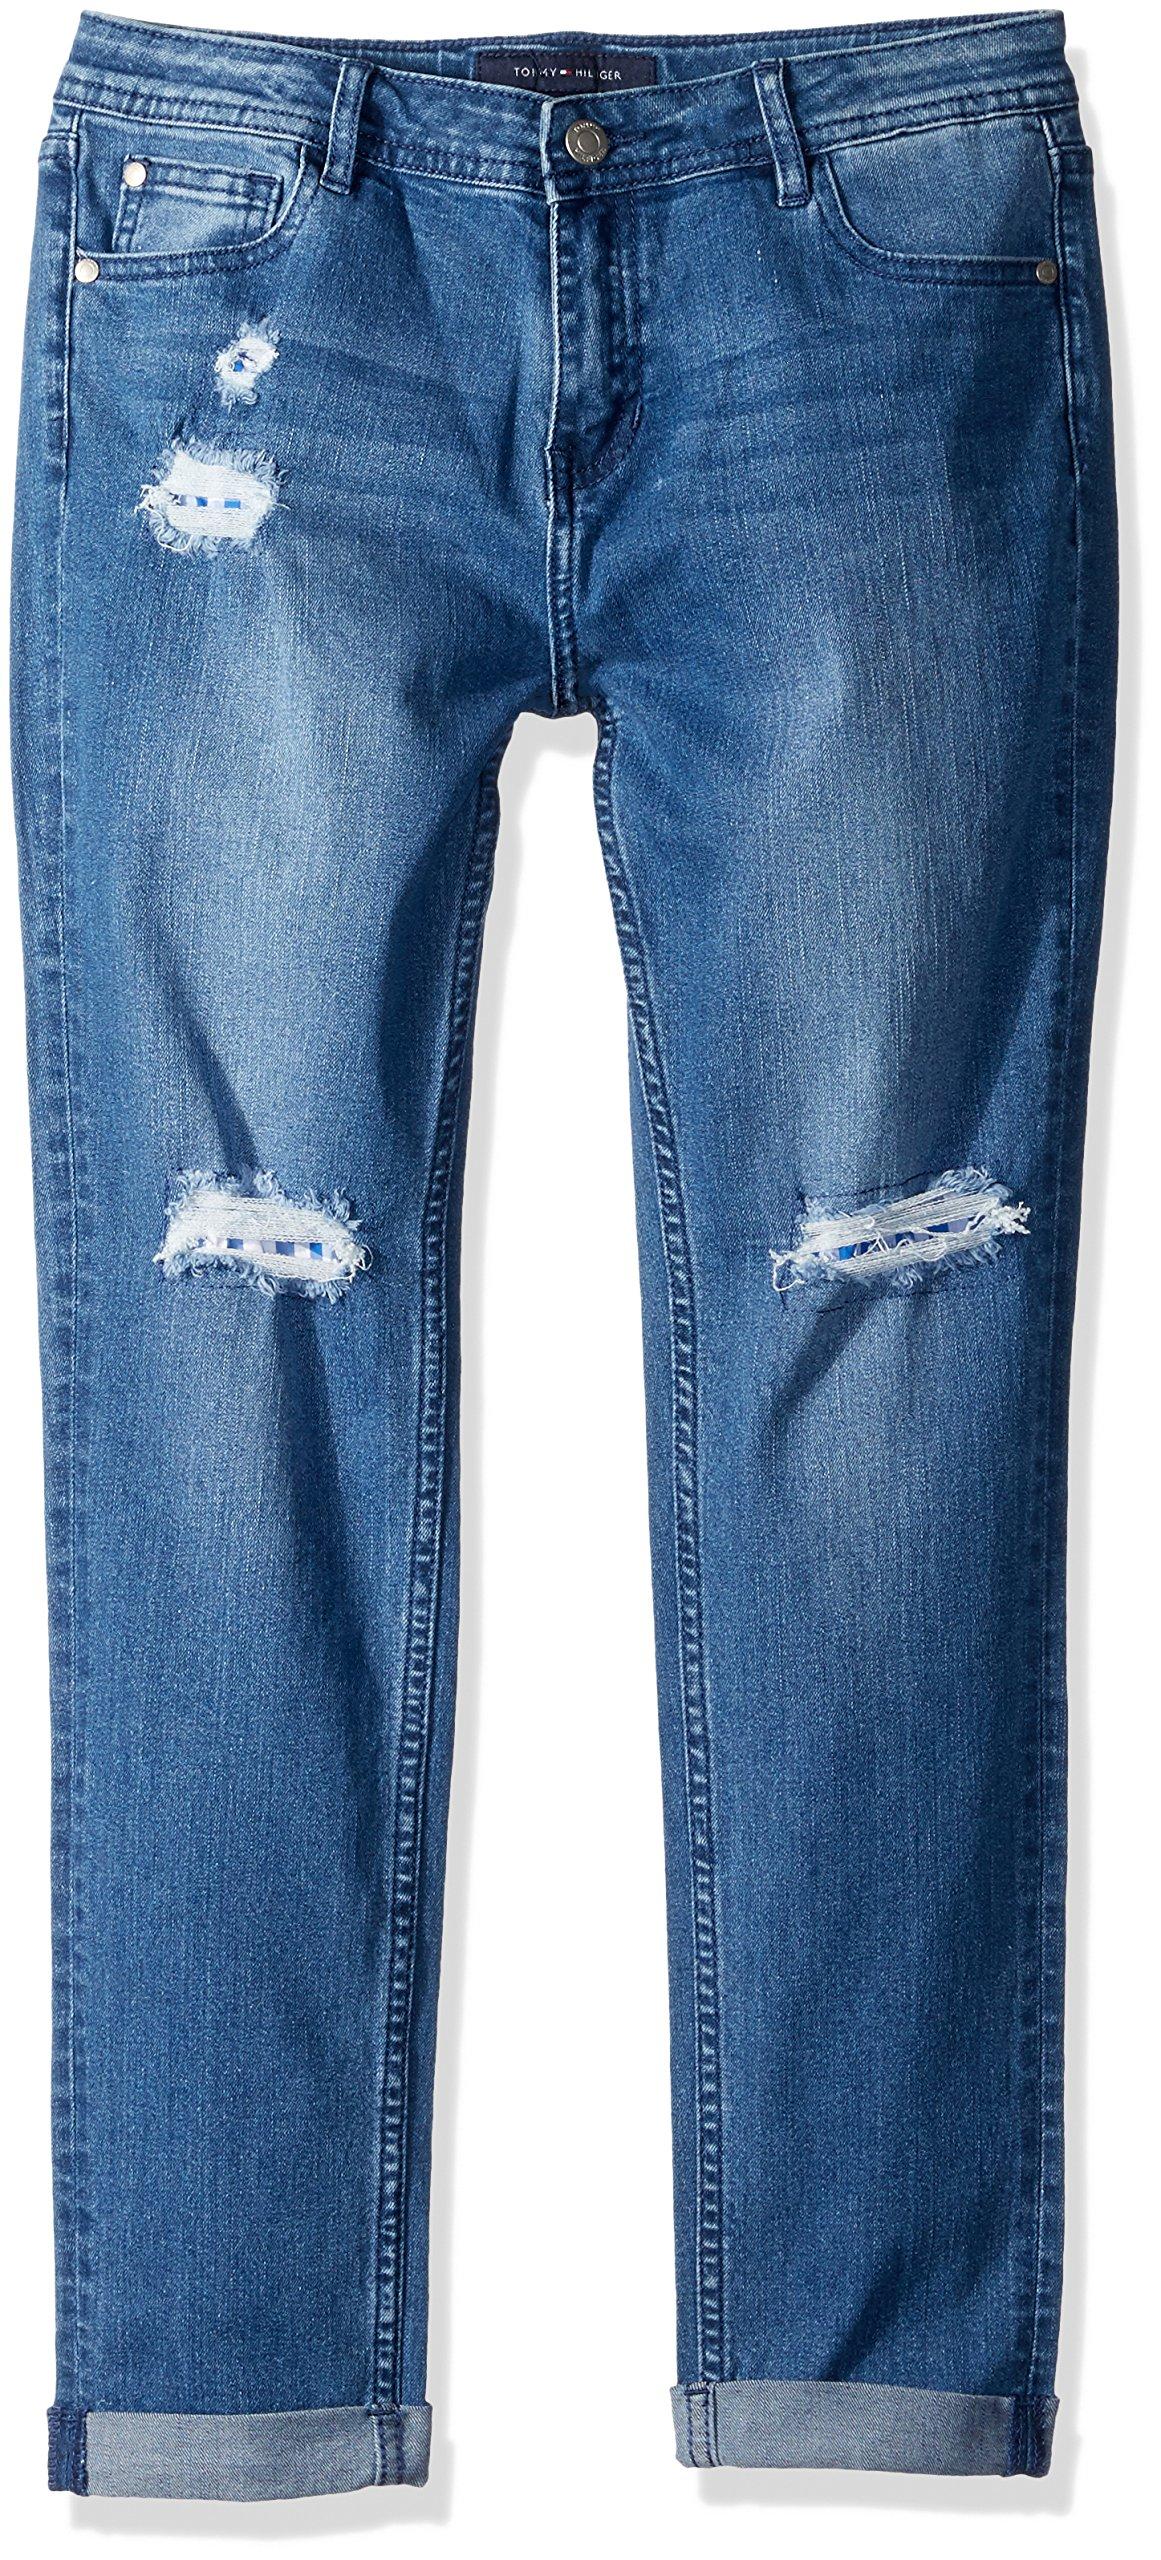 e23aa21ff5a Galleon - Tommy Hilfiger Big Girls' Stretch Denim Jeans, Blueberry Blue, 7